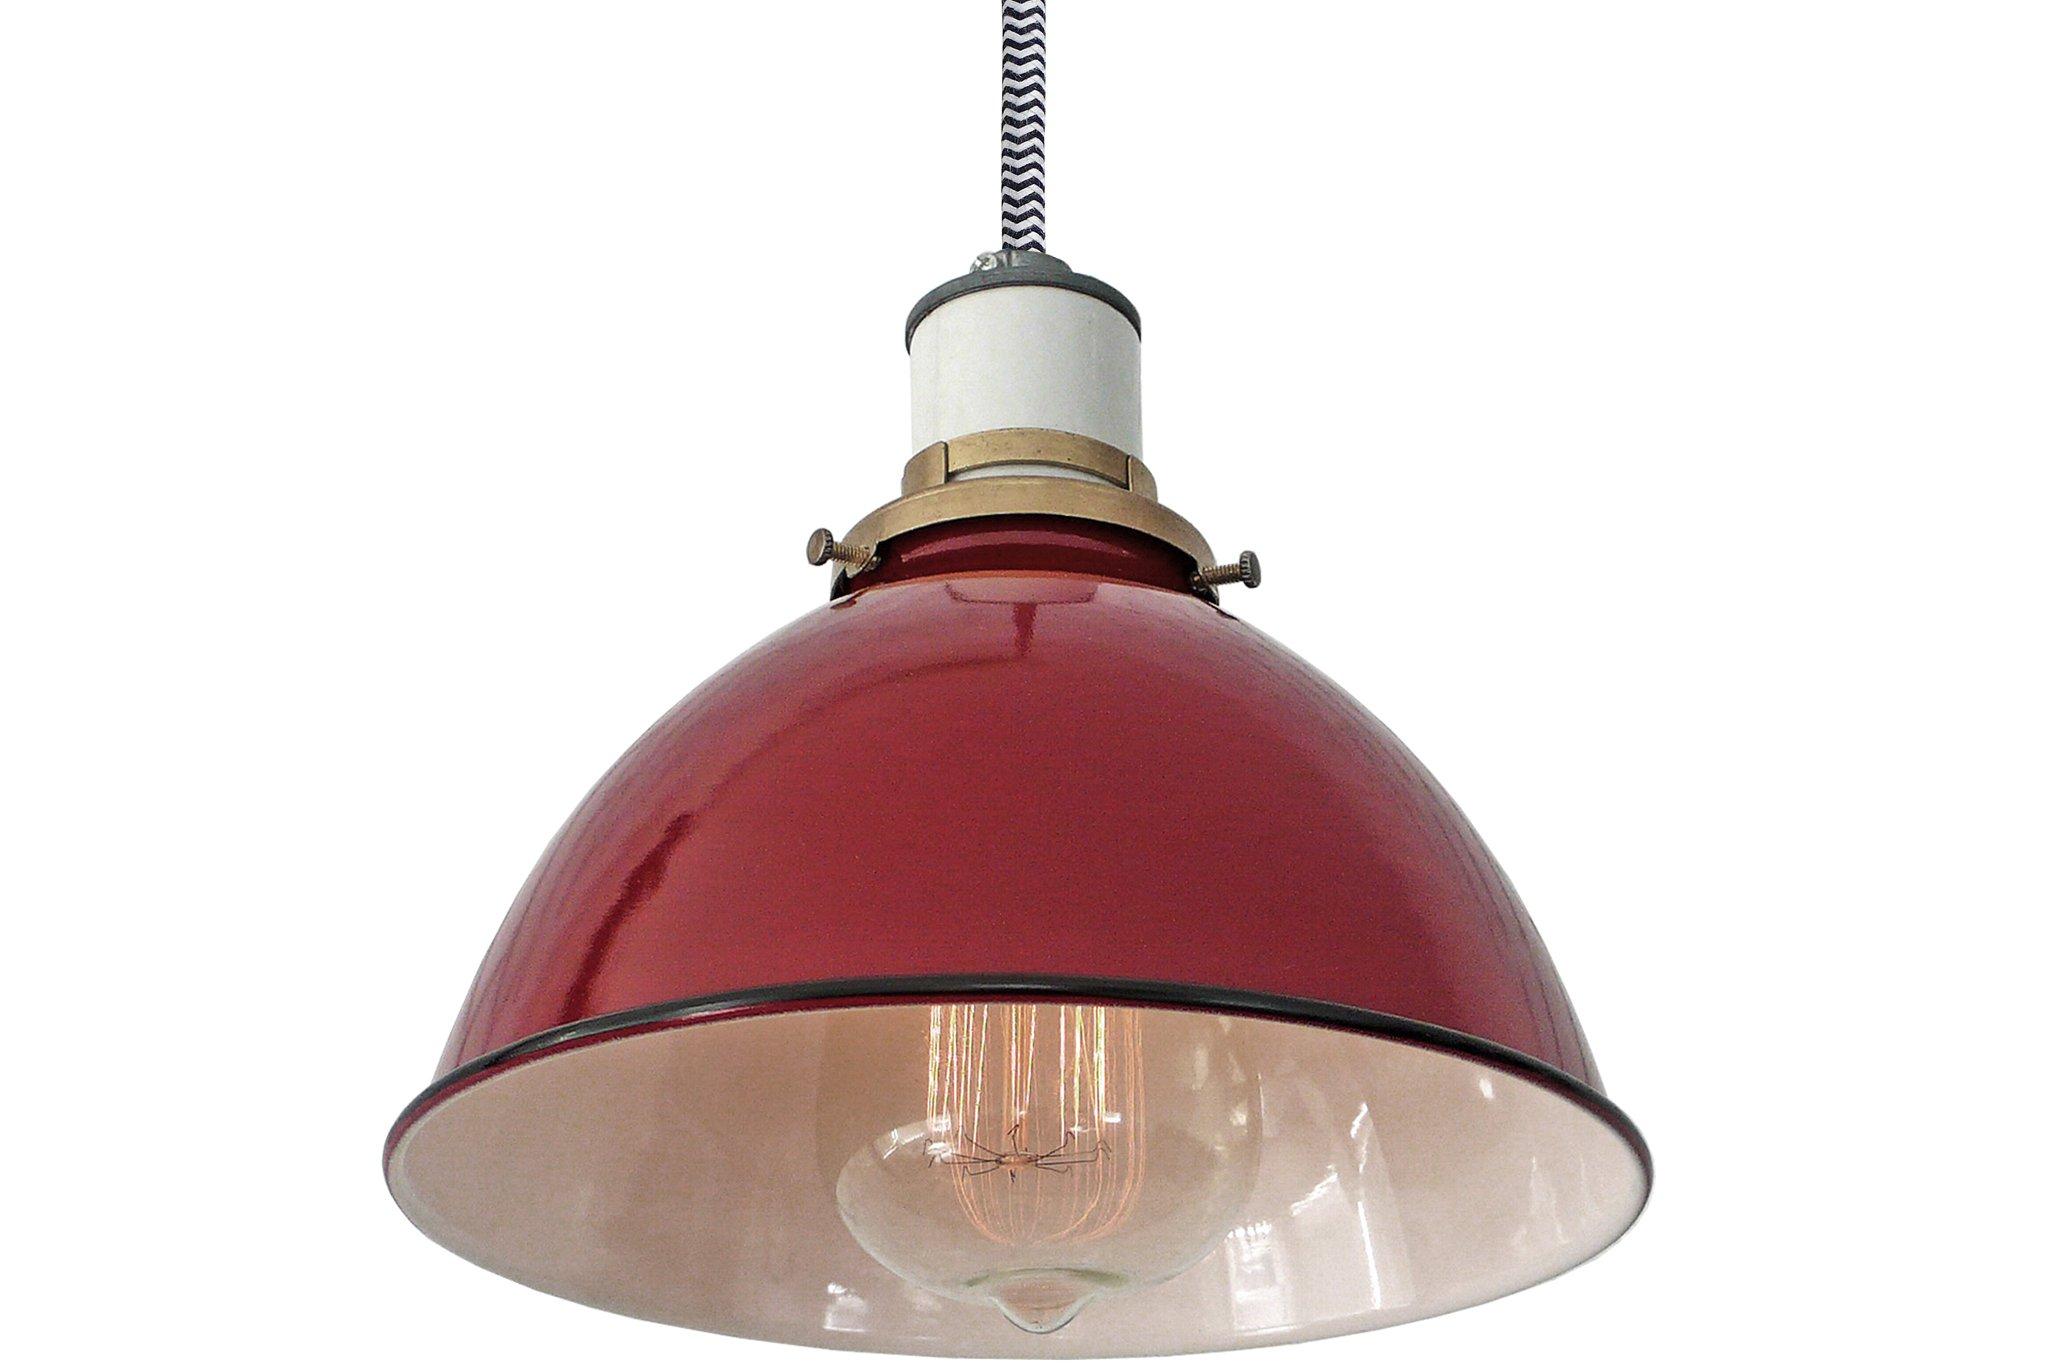 THE SULLIVAN LAMP w/Black & White Cord